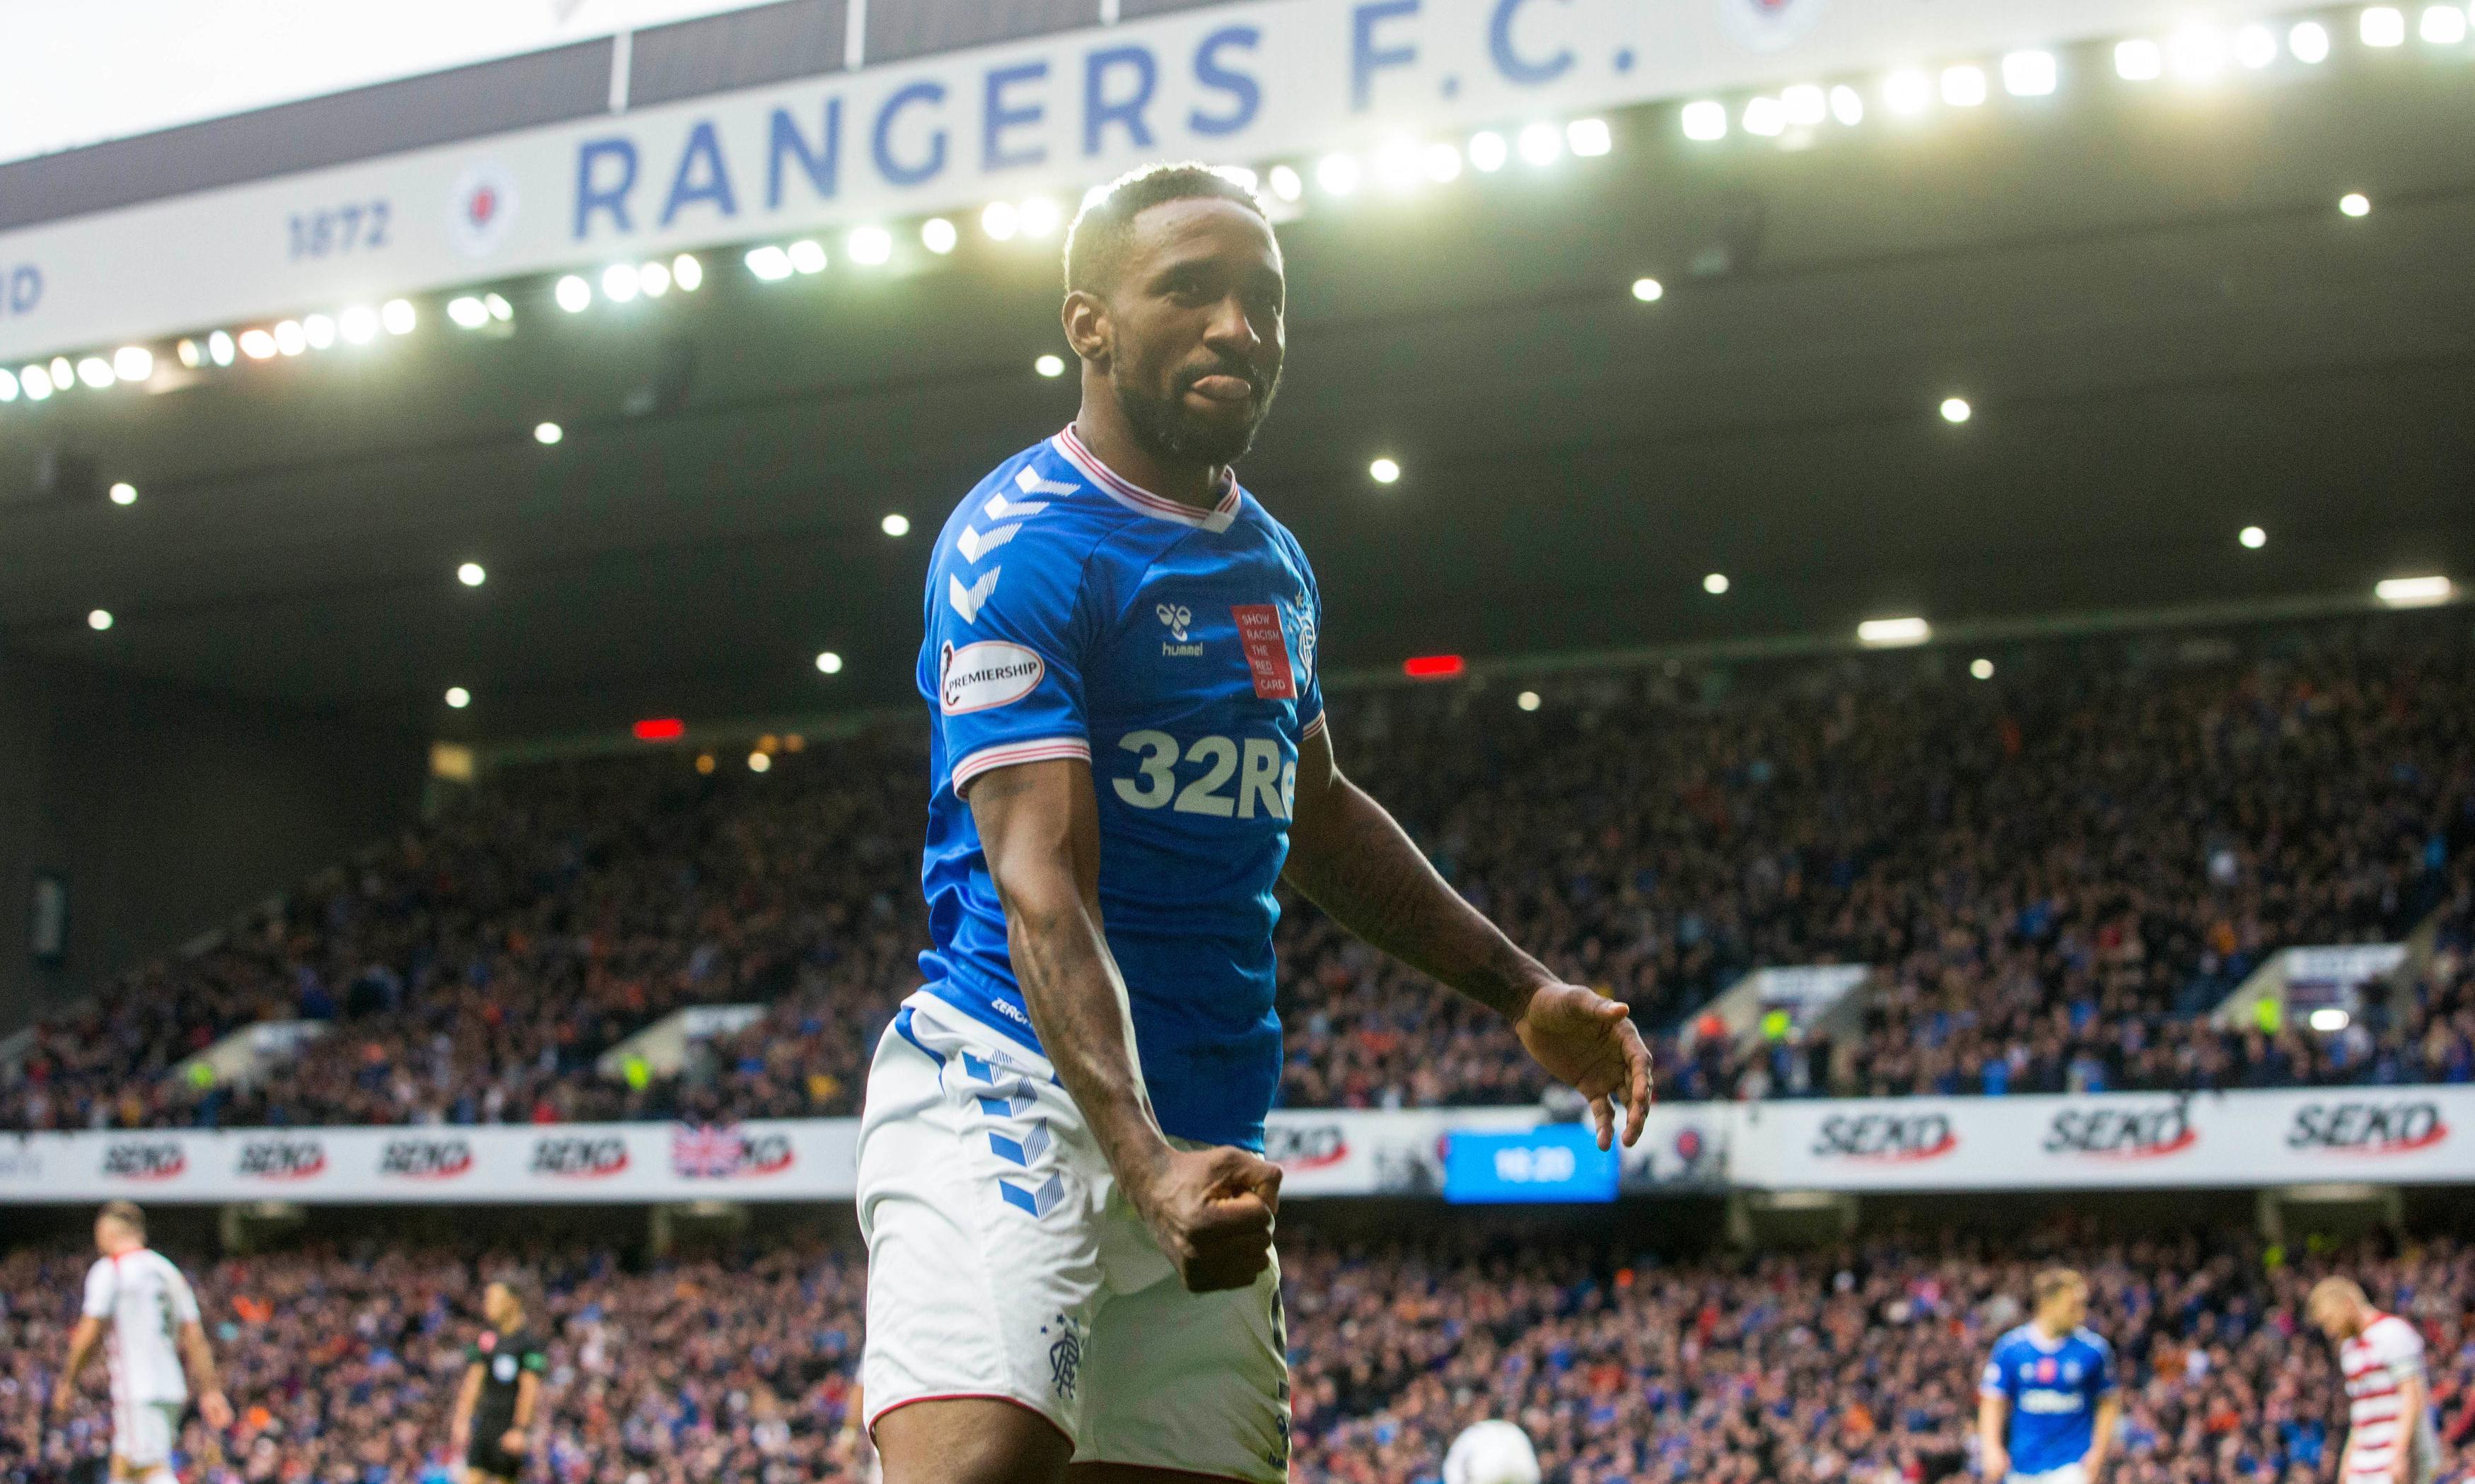 Jermain Defoe hat-trick puts Rangers top after 10-man Celtic lose